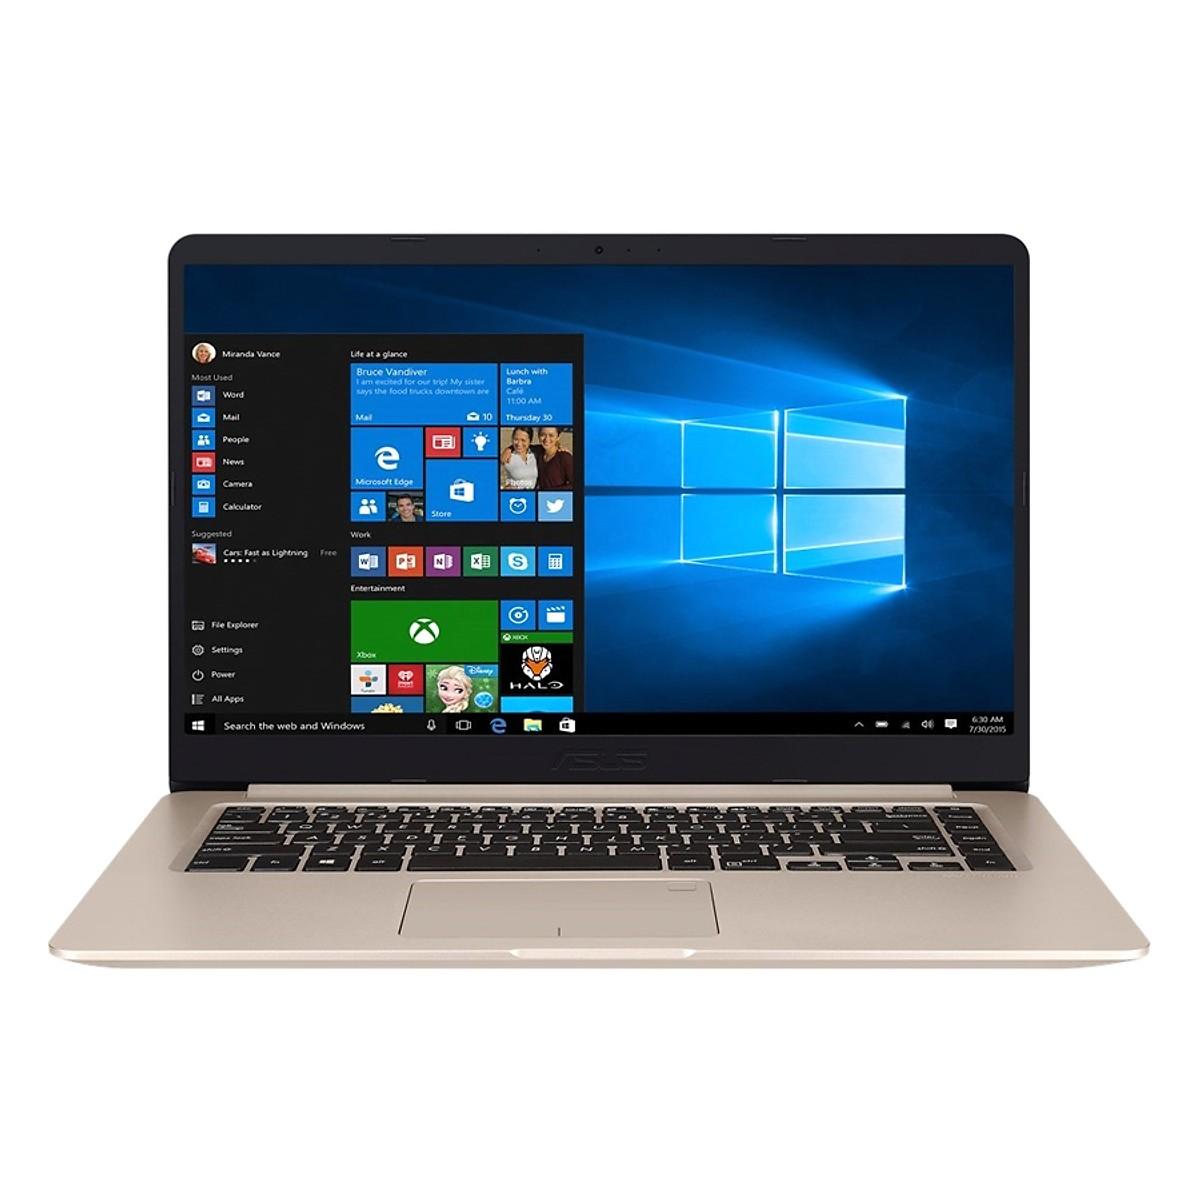 Asus   Máy tính xách tay - Laptop  Laptop Asus Vivobook 15 A510UA-BR873T Core i3-7100U/Win10 (15.6 i